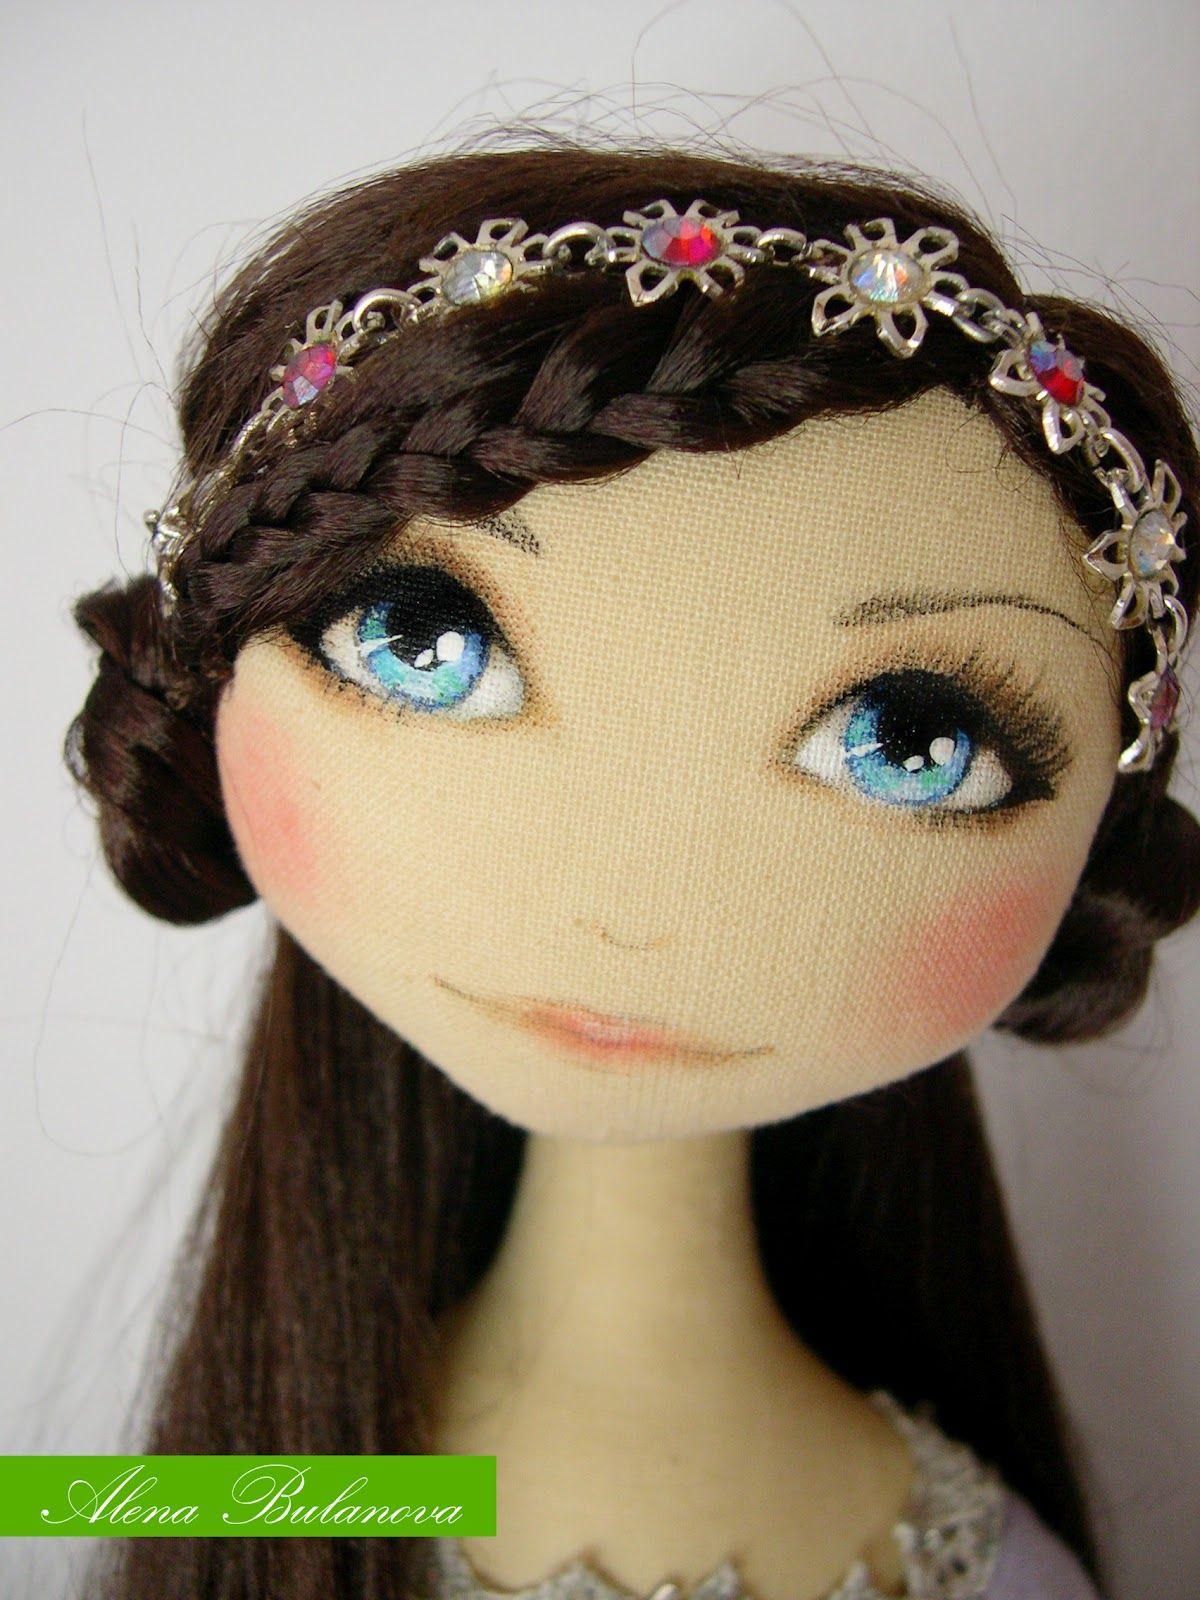 Alena Bulanova: Face - wow, beautiful!!